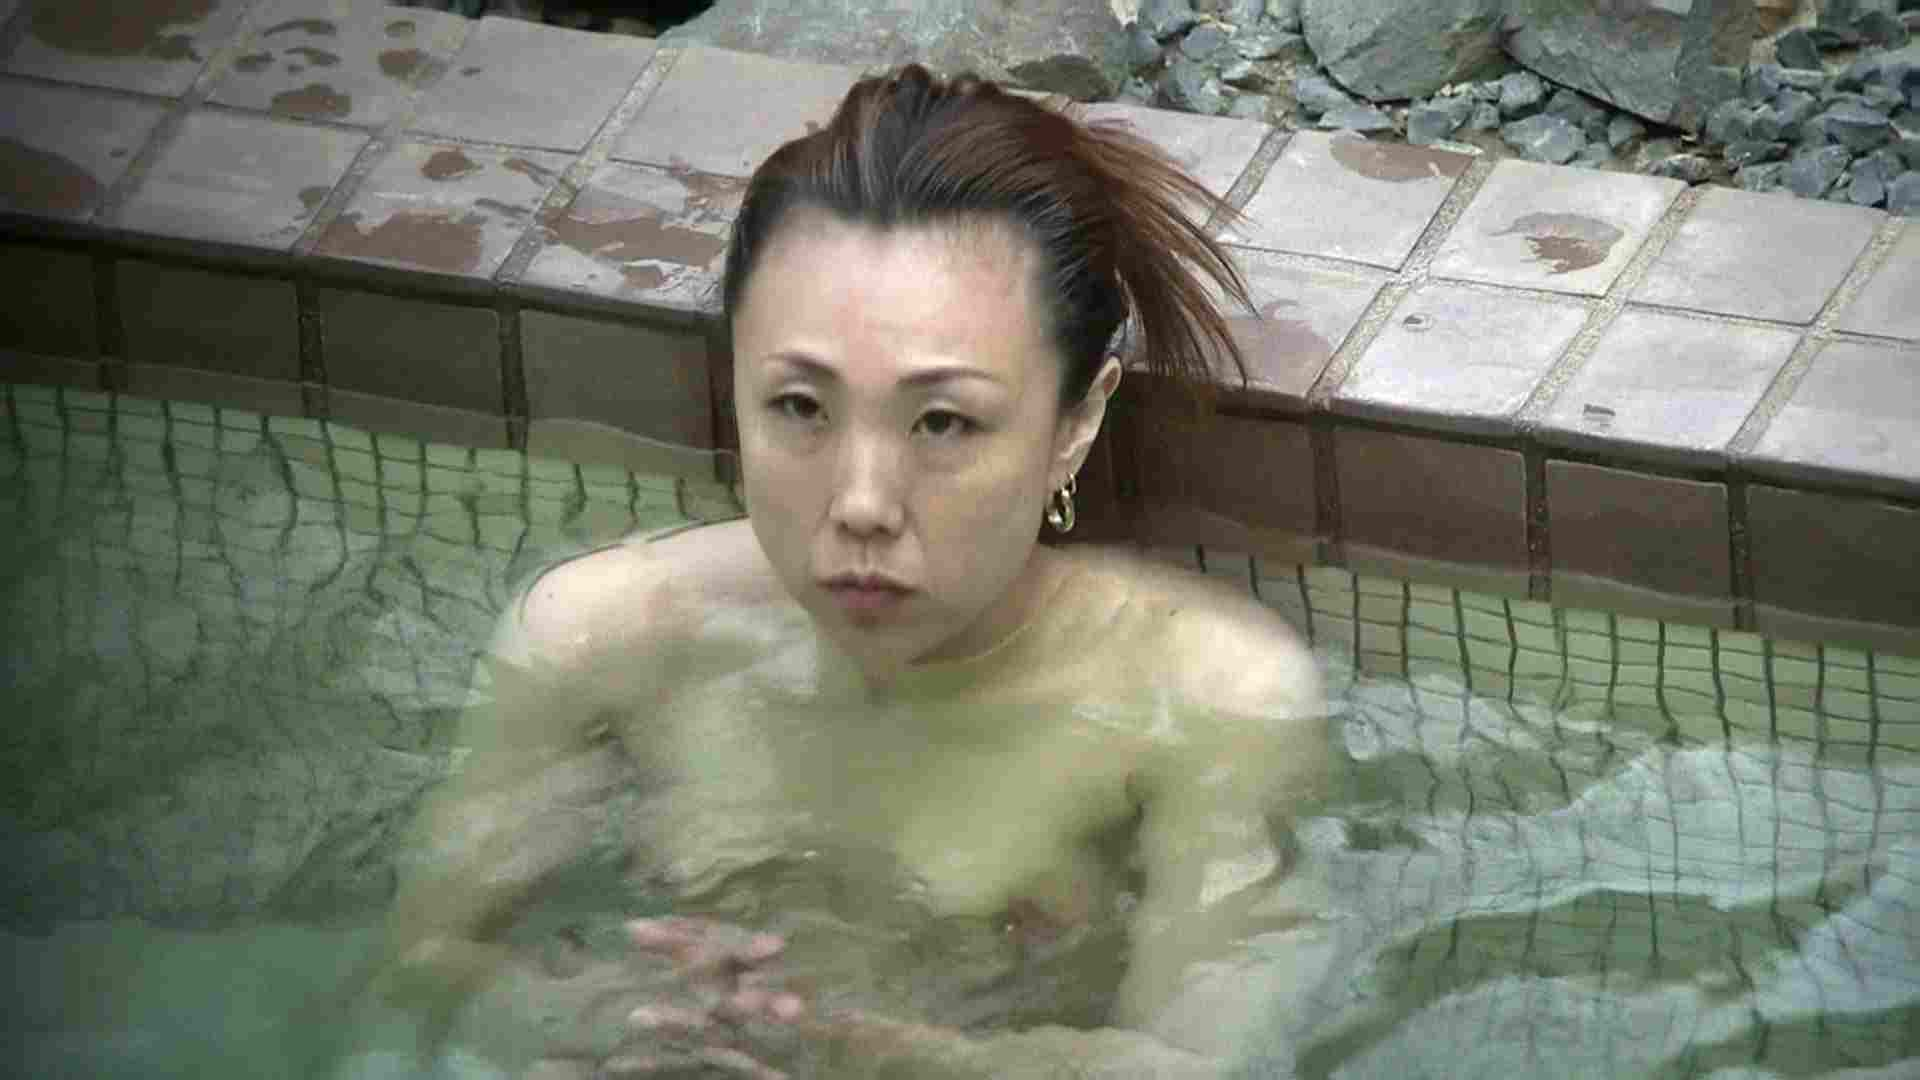 Aquaな露天風呂Vol.654 HなOL | 盗撮  60pic 30